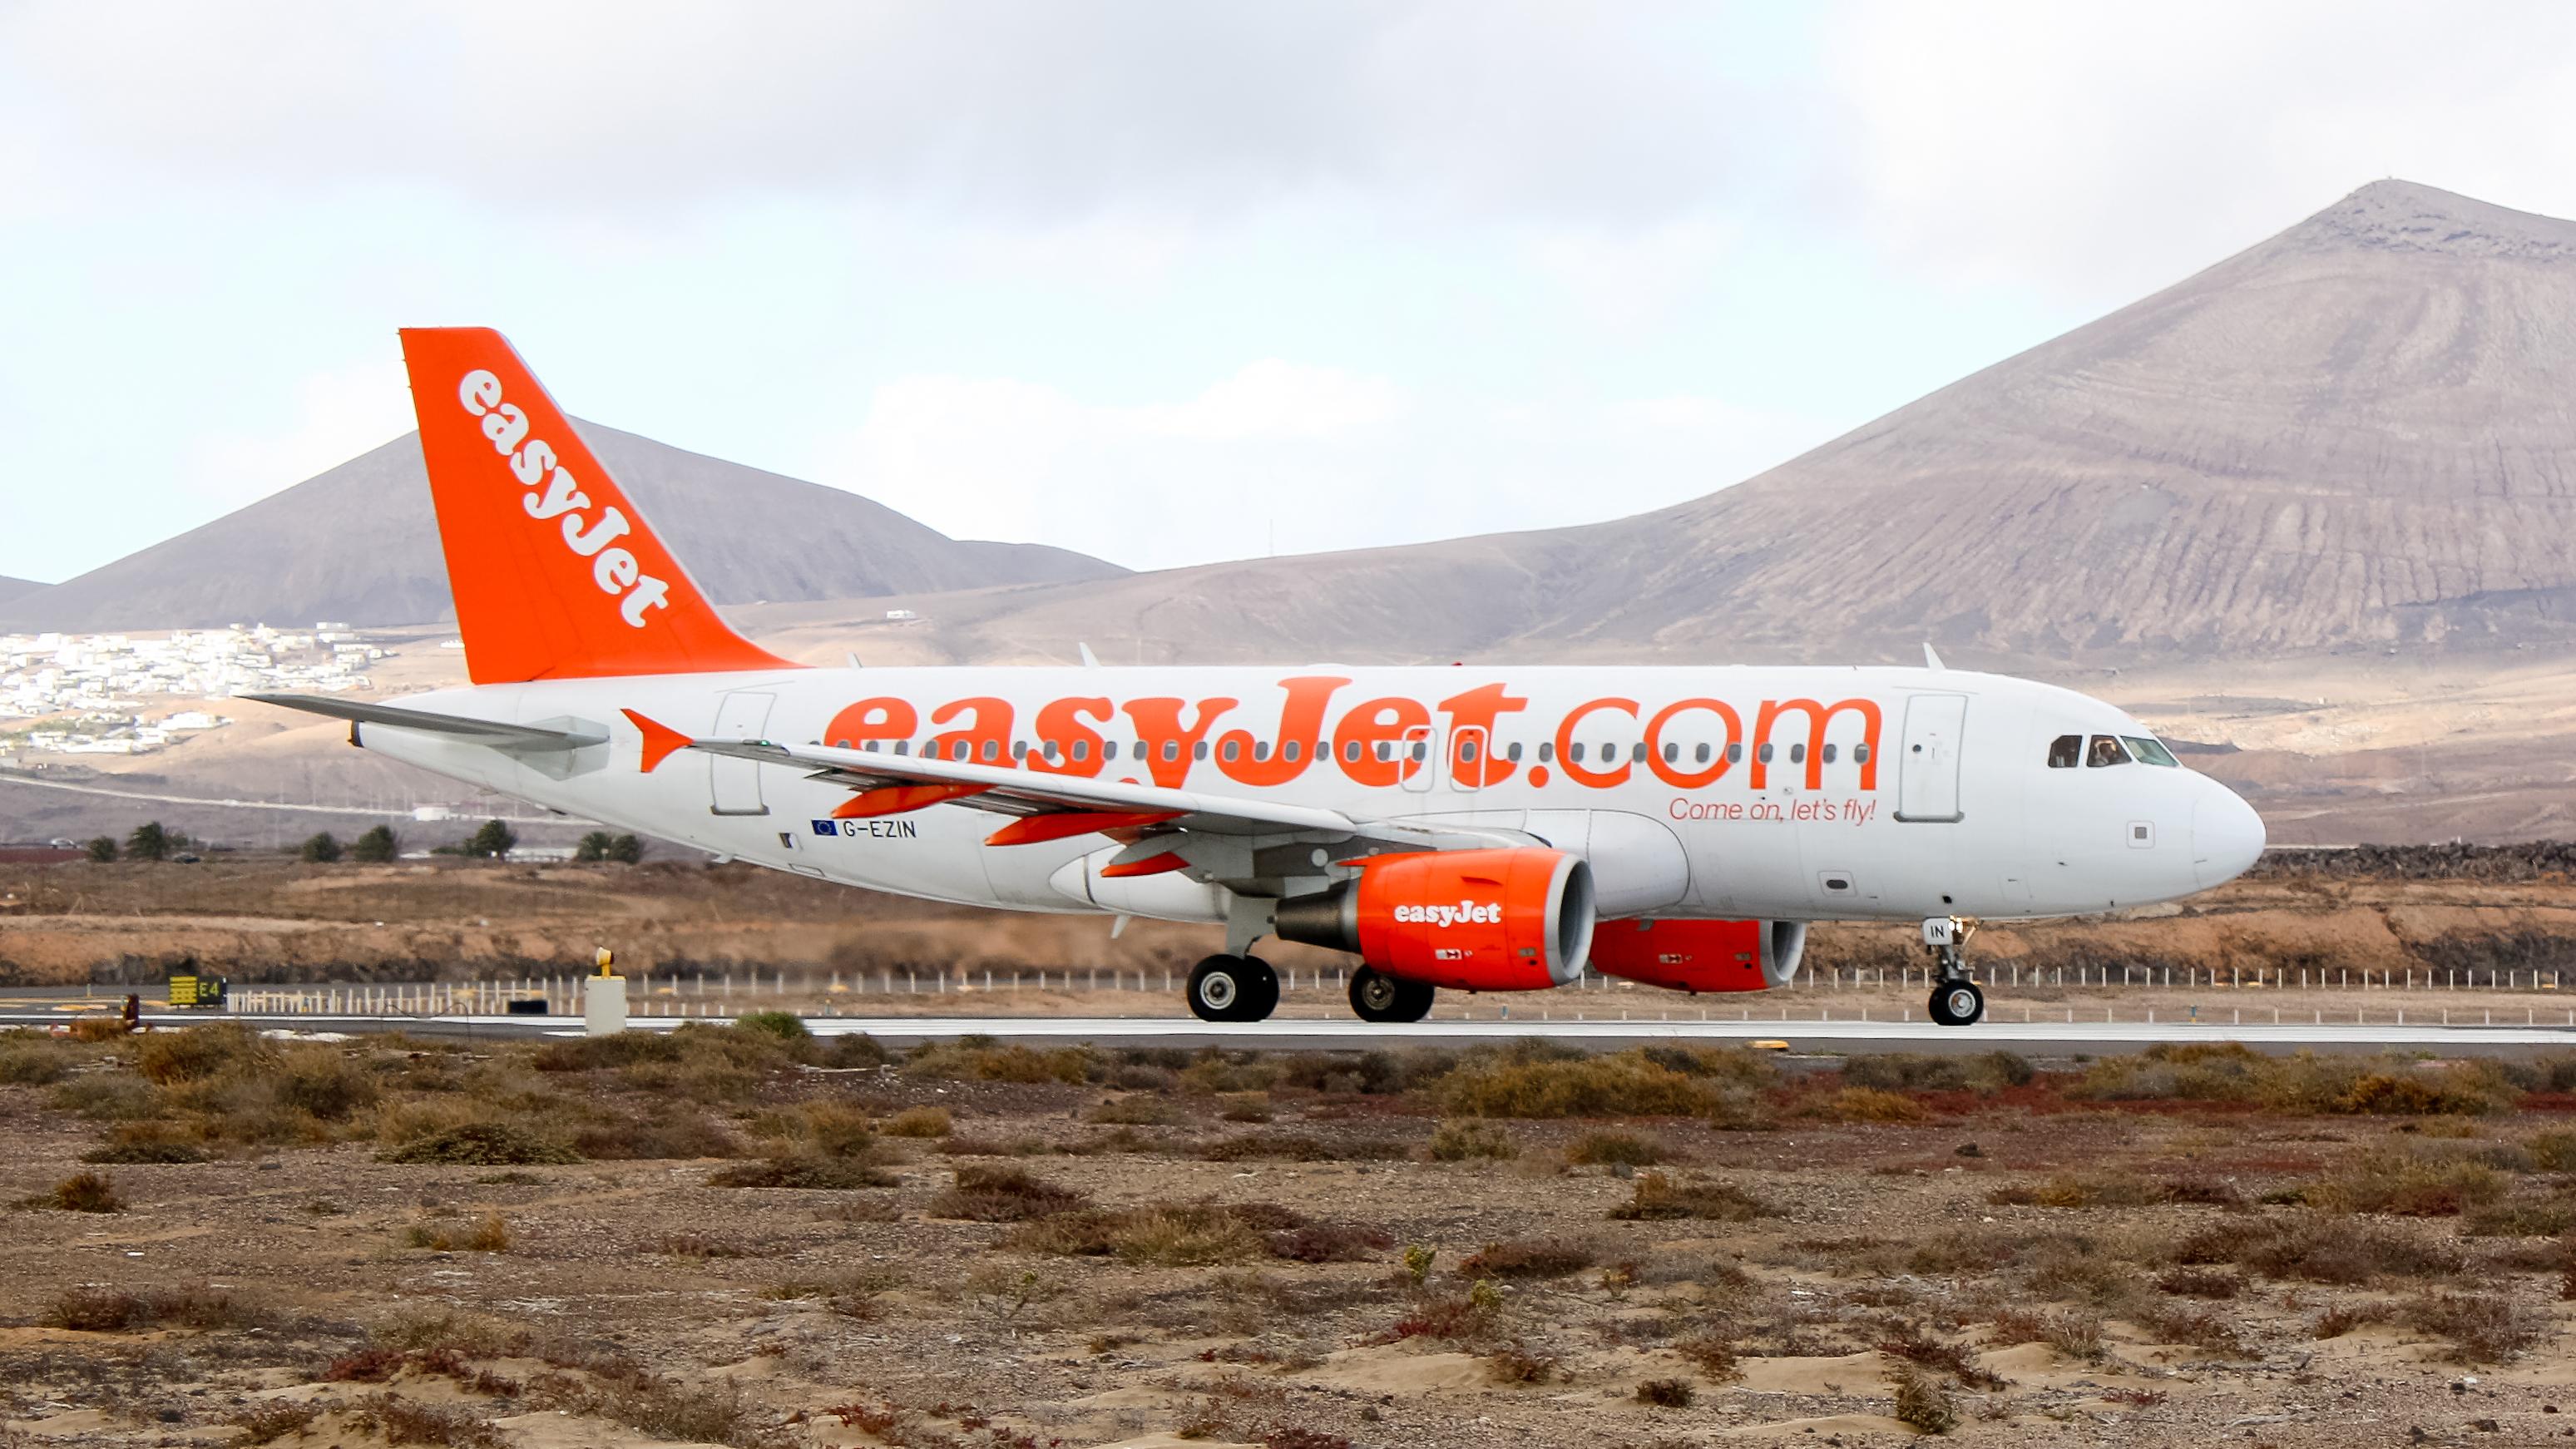 easyjet a319 - photo #2